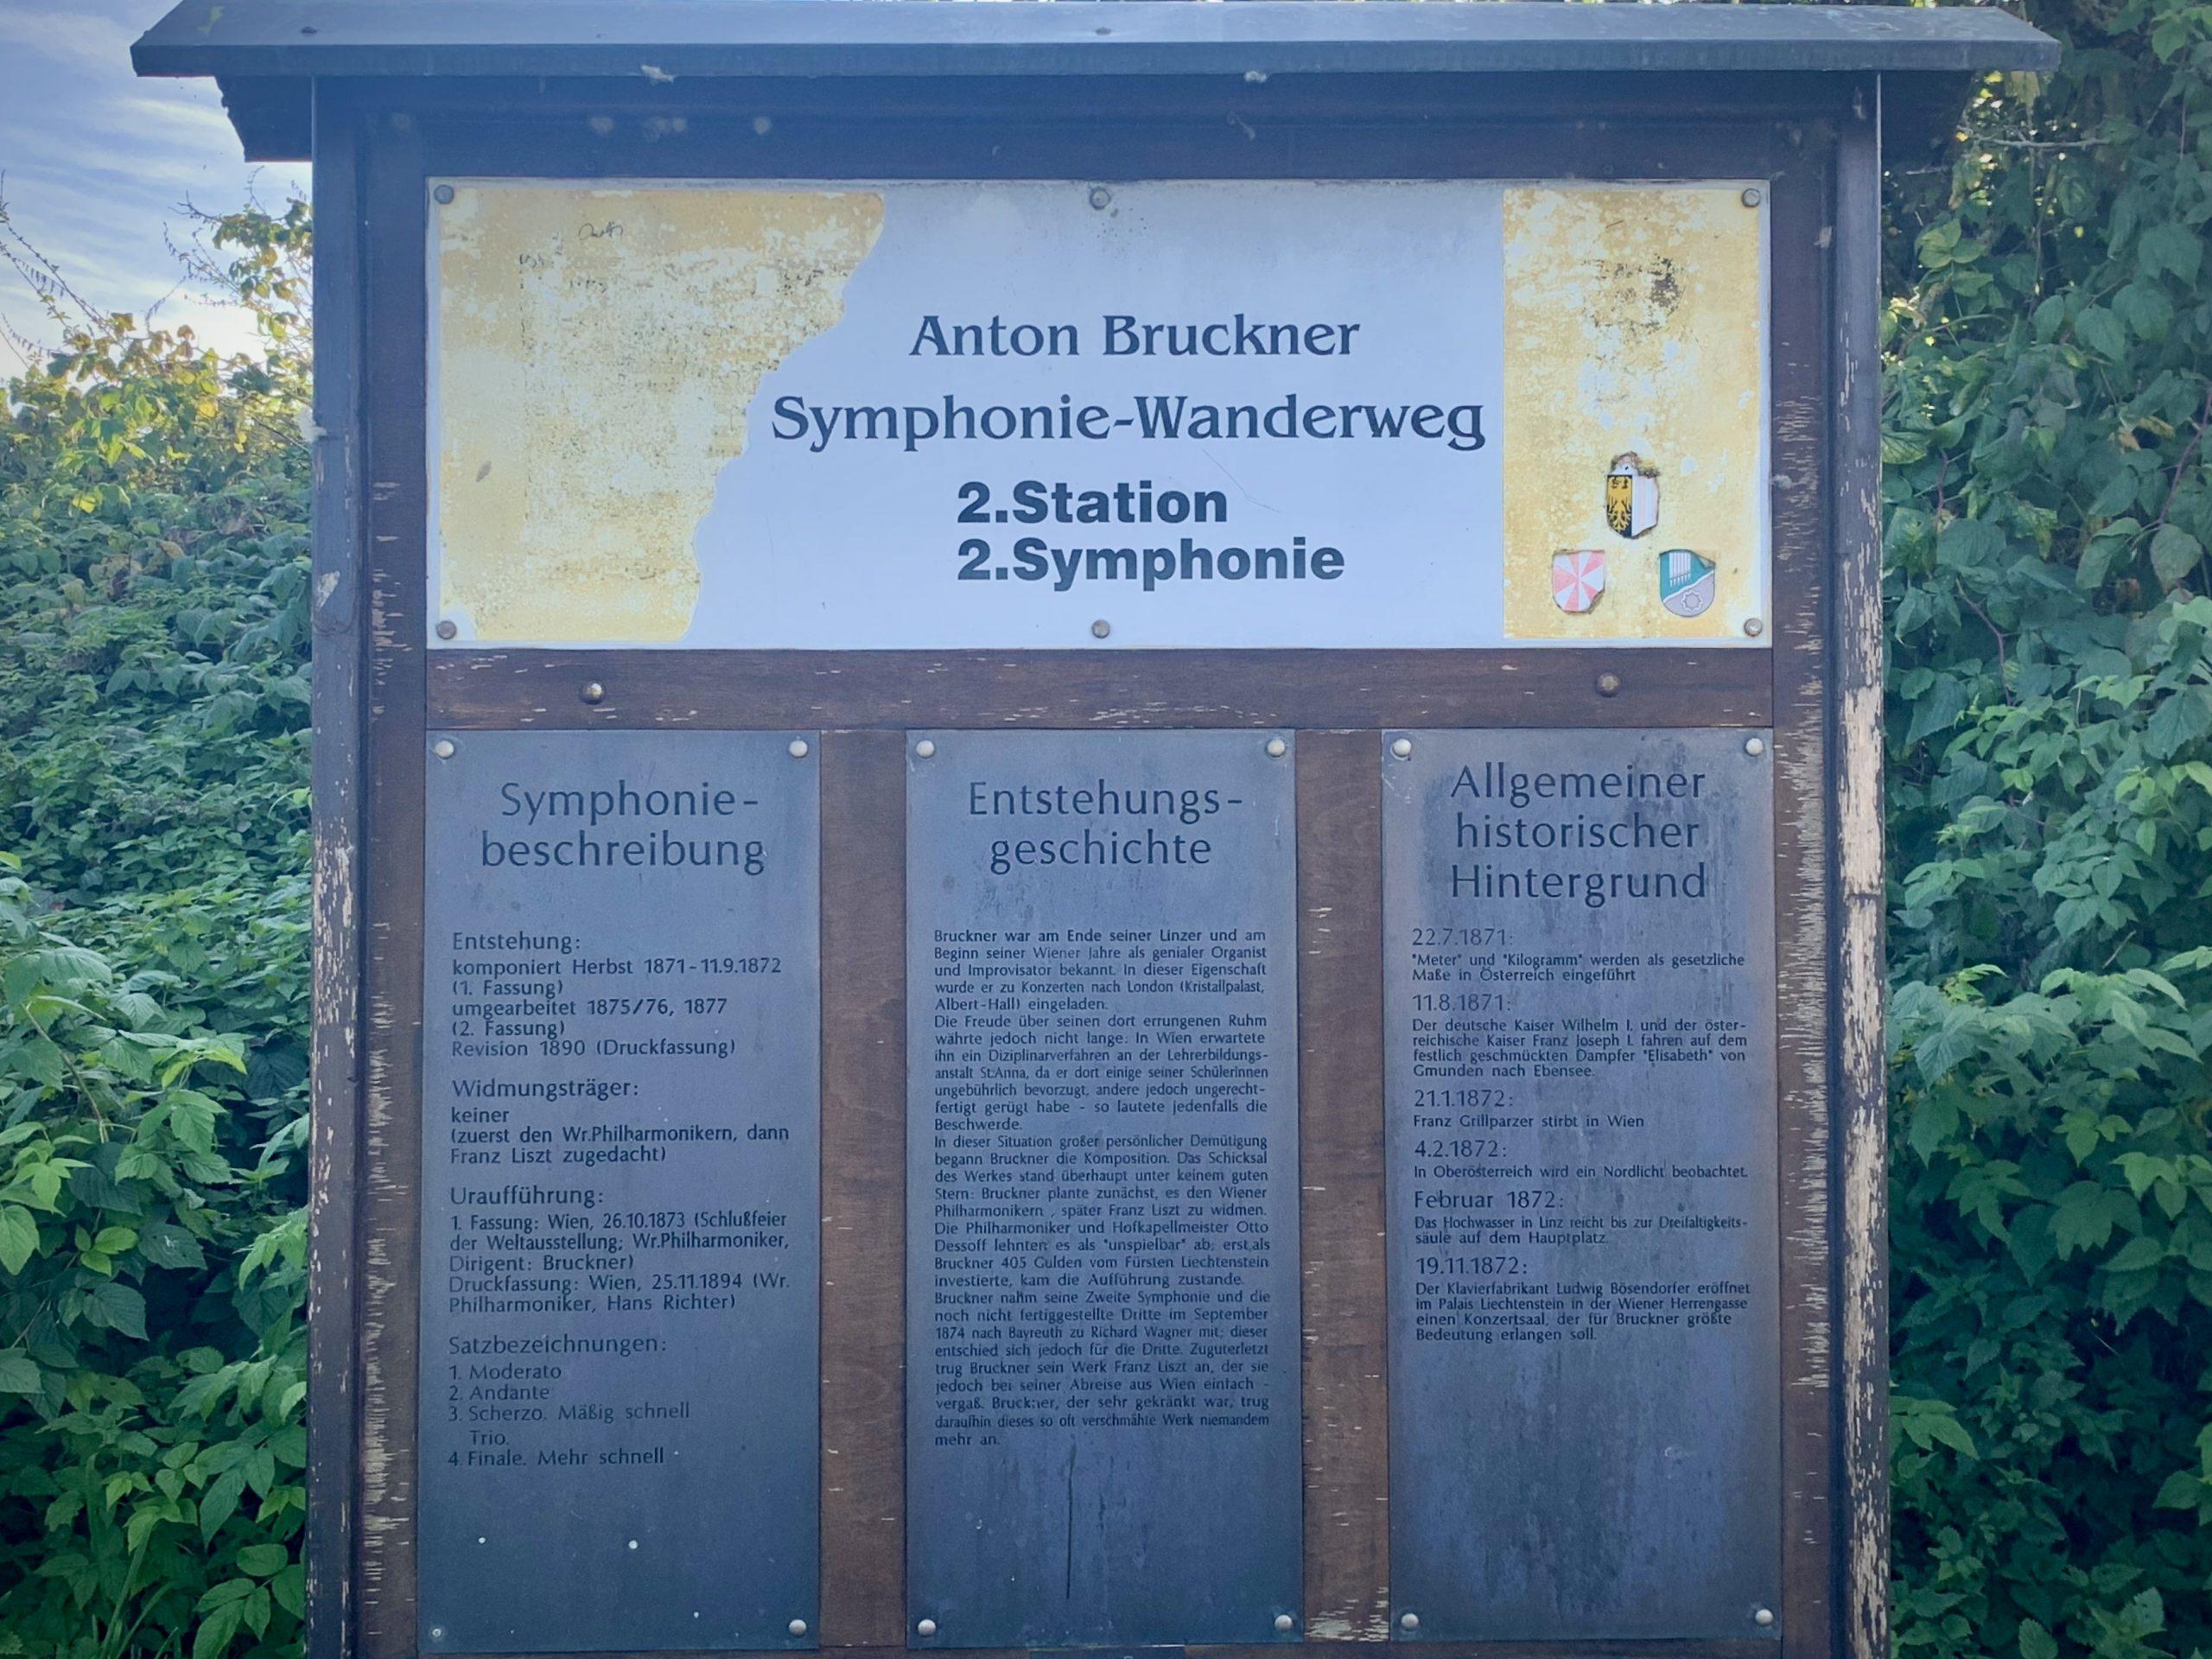 Anton Bruckner Symphonie-Wanderweg